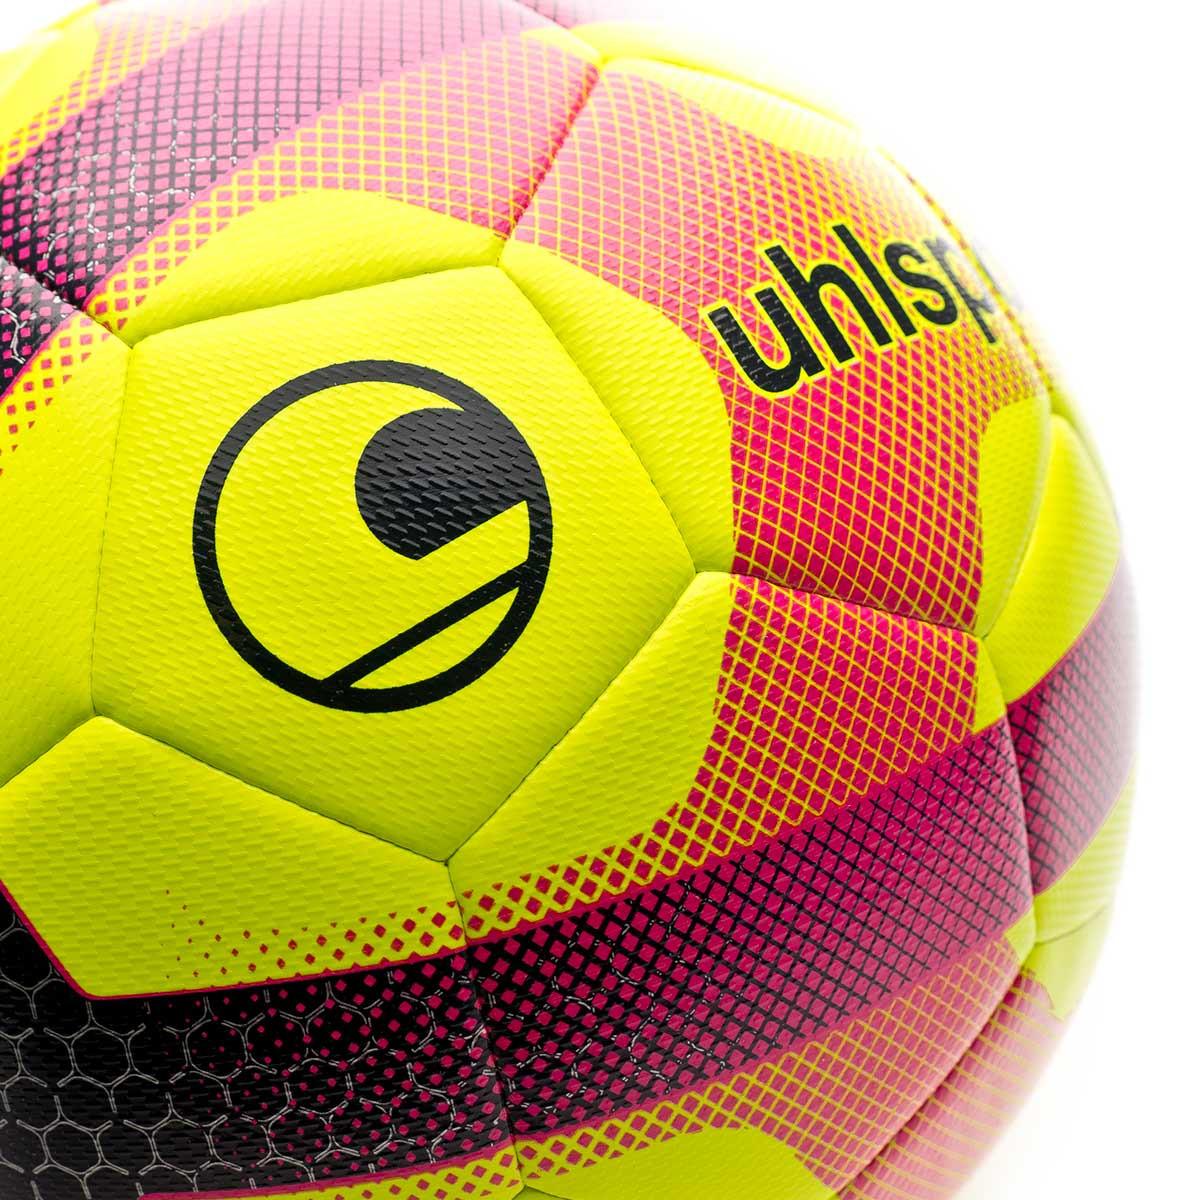 Bal/ón Uhlsport Elysia Pro Ligue 2019 Fluor Yellow-Navy-Fuchsia